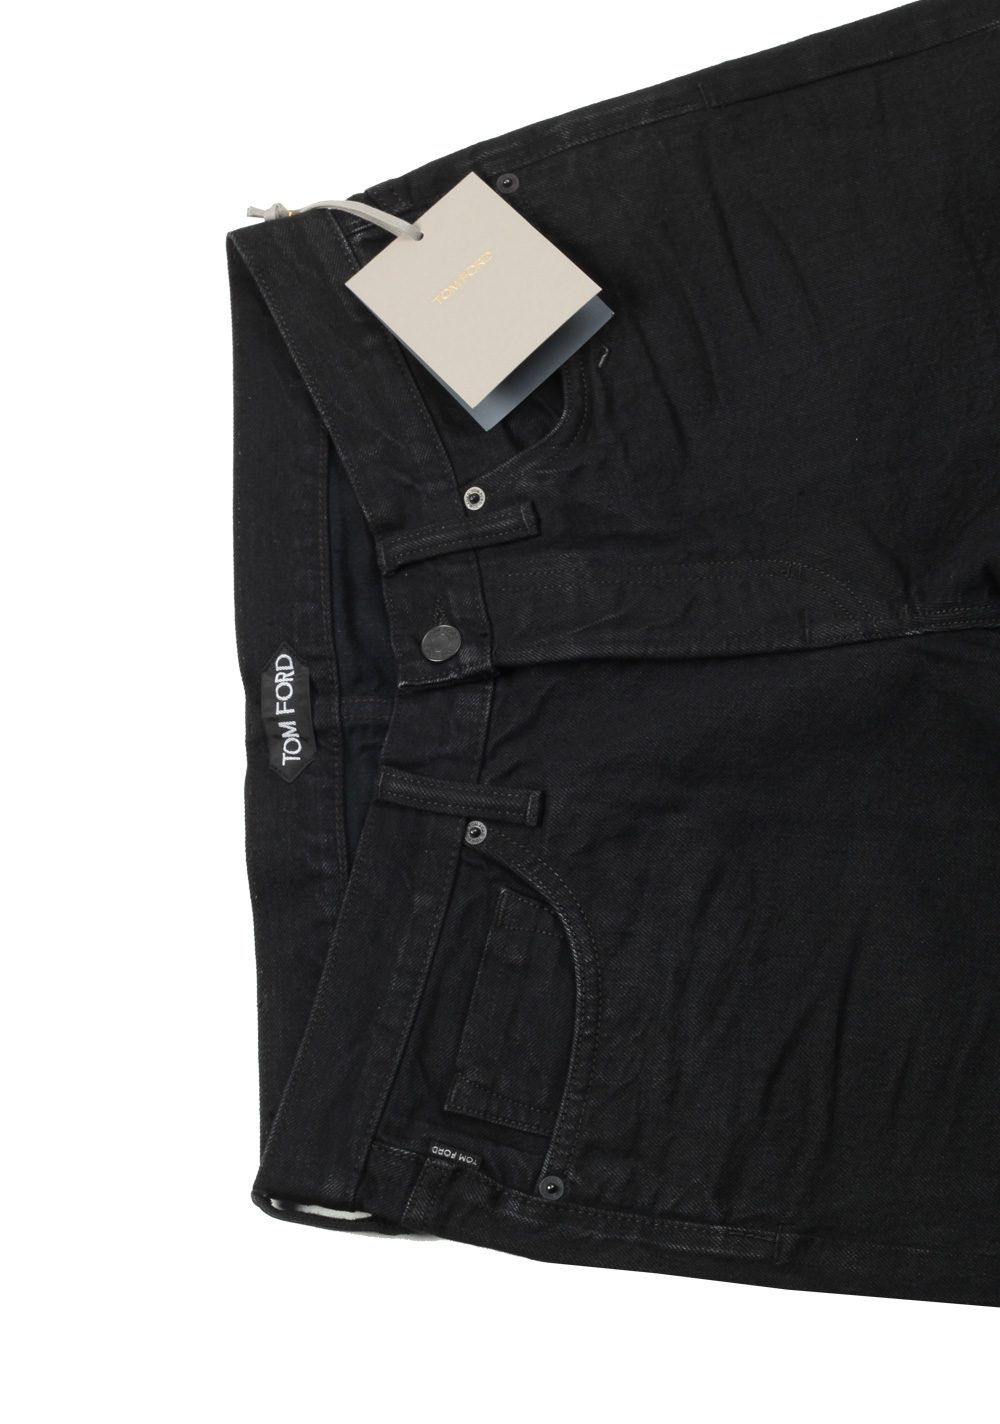 TOM FORD Black Straight Jeans TFD002 Size 48 / 32 U.S. | Costume Limité